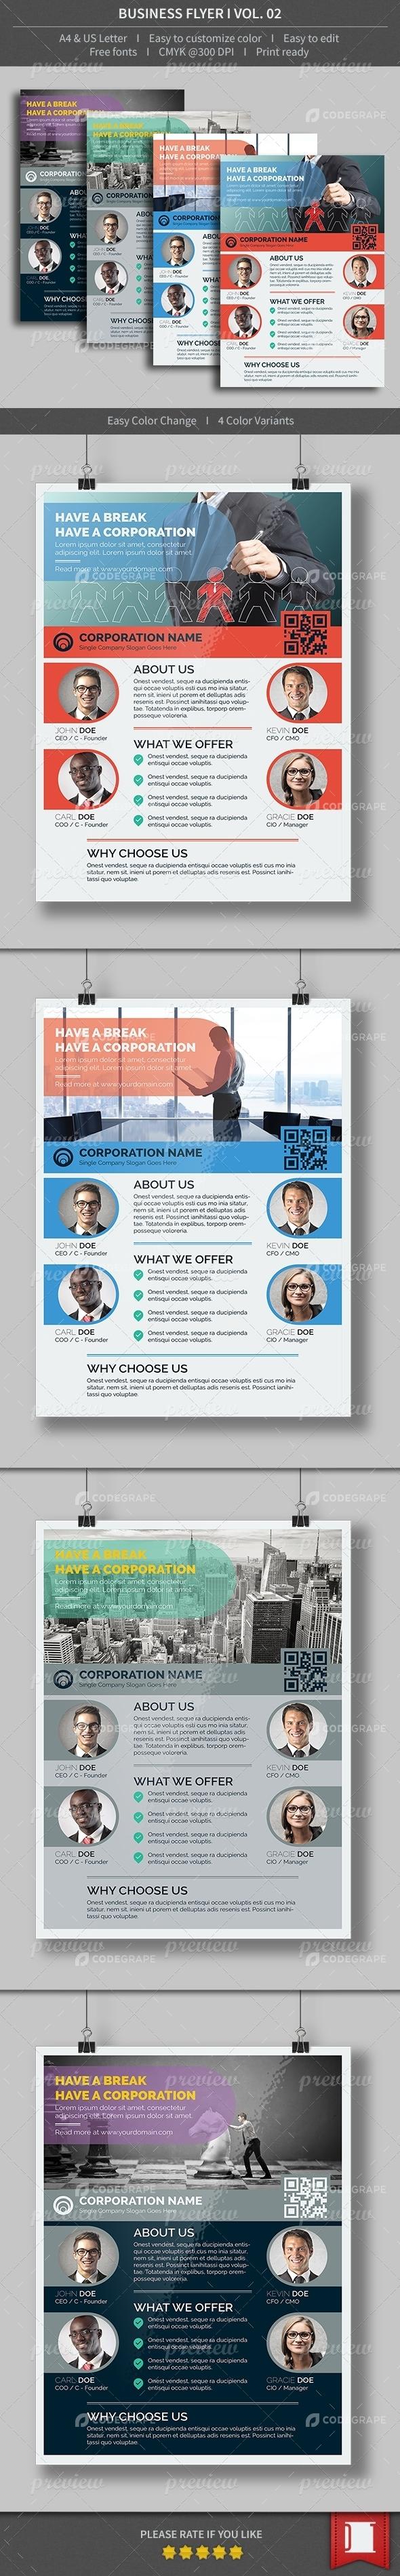 Business Flyer - Volume 02